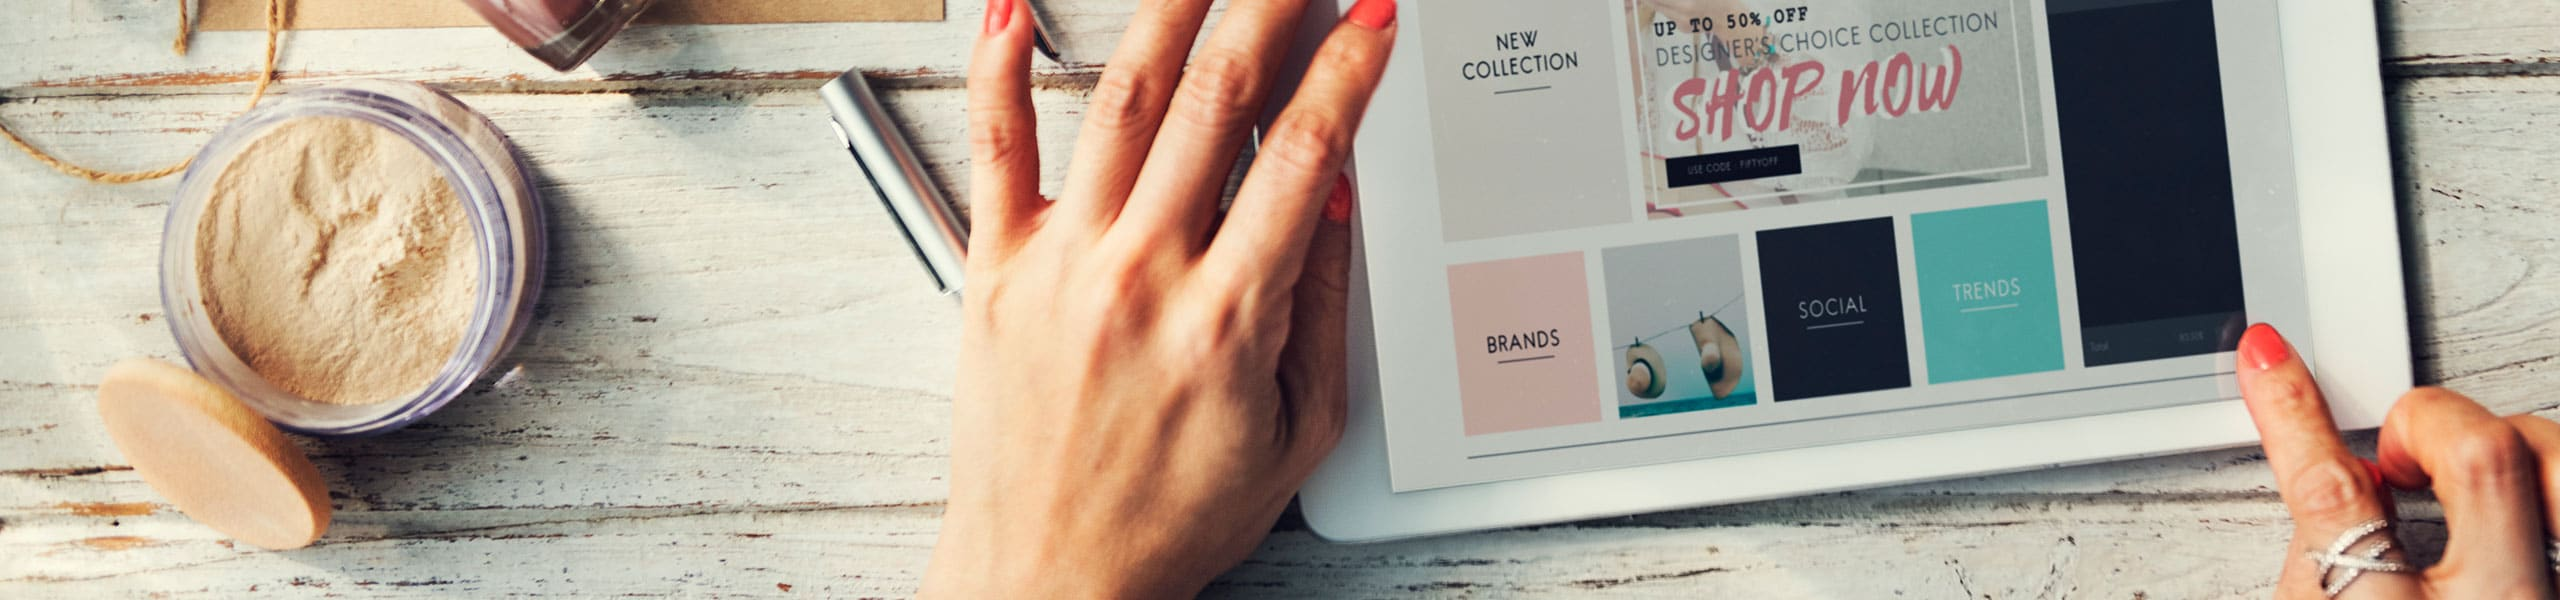 5 Ways to Improve Your Digital Marketing Strategy   Emarsys